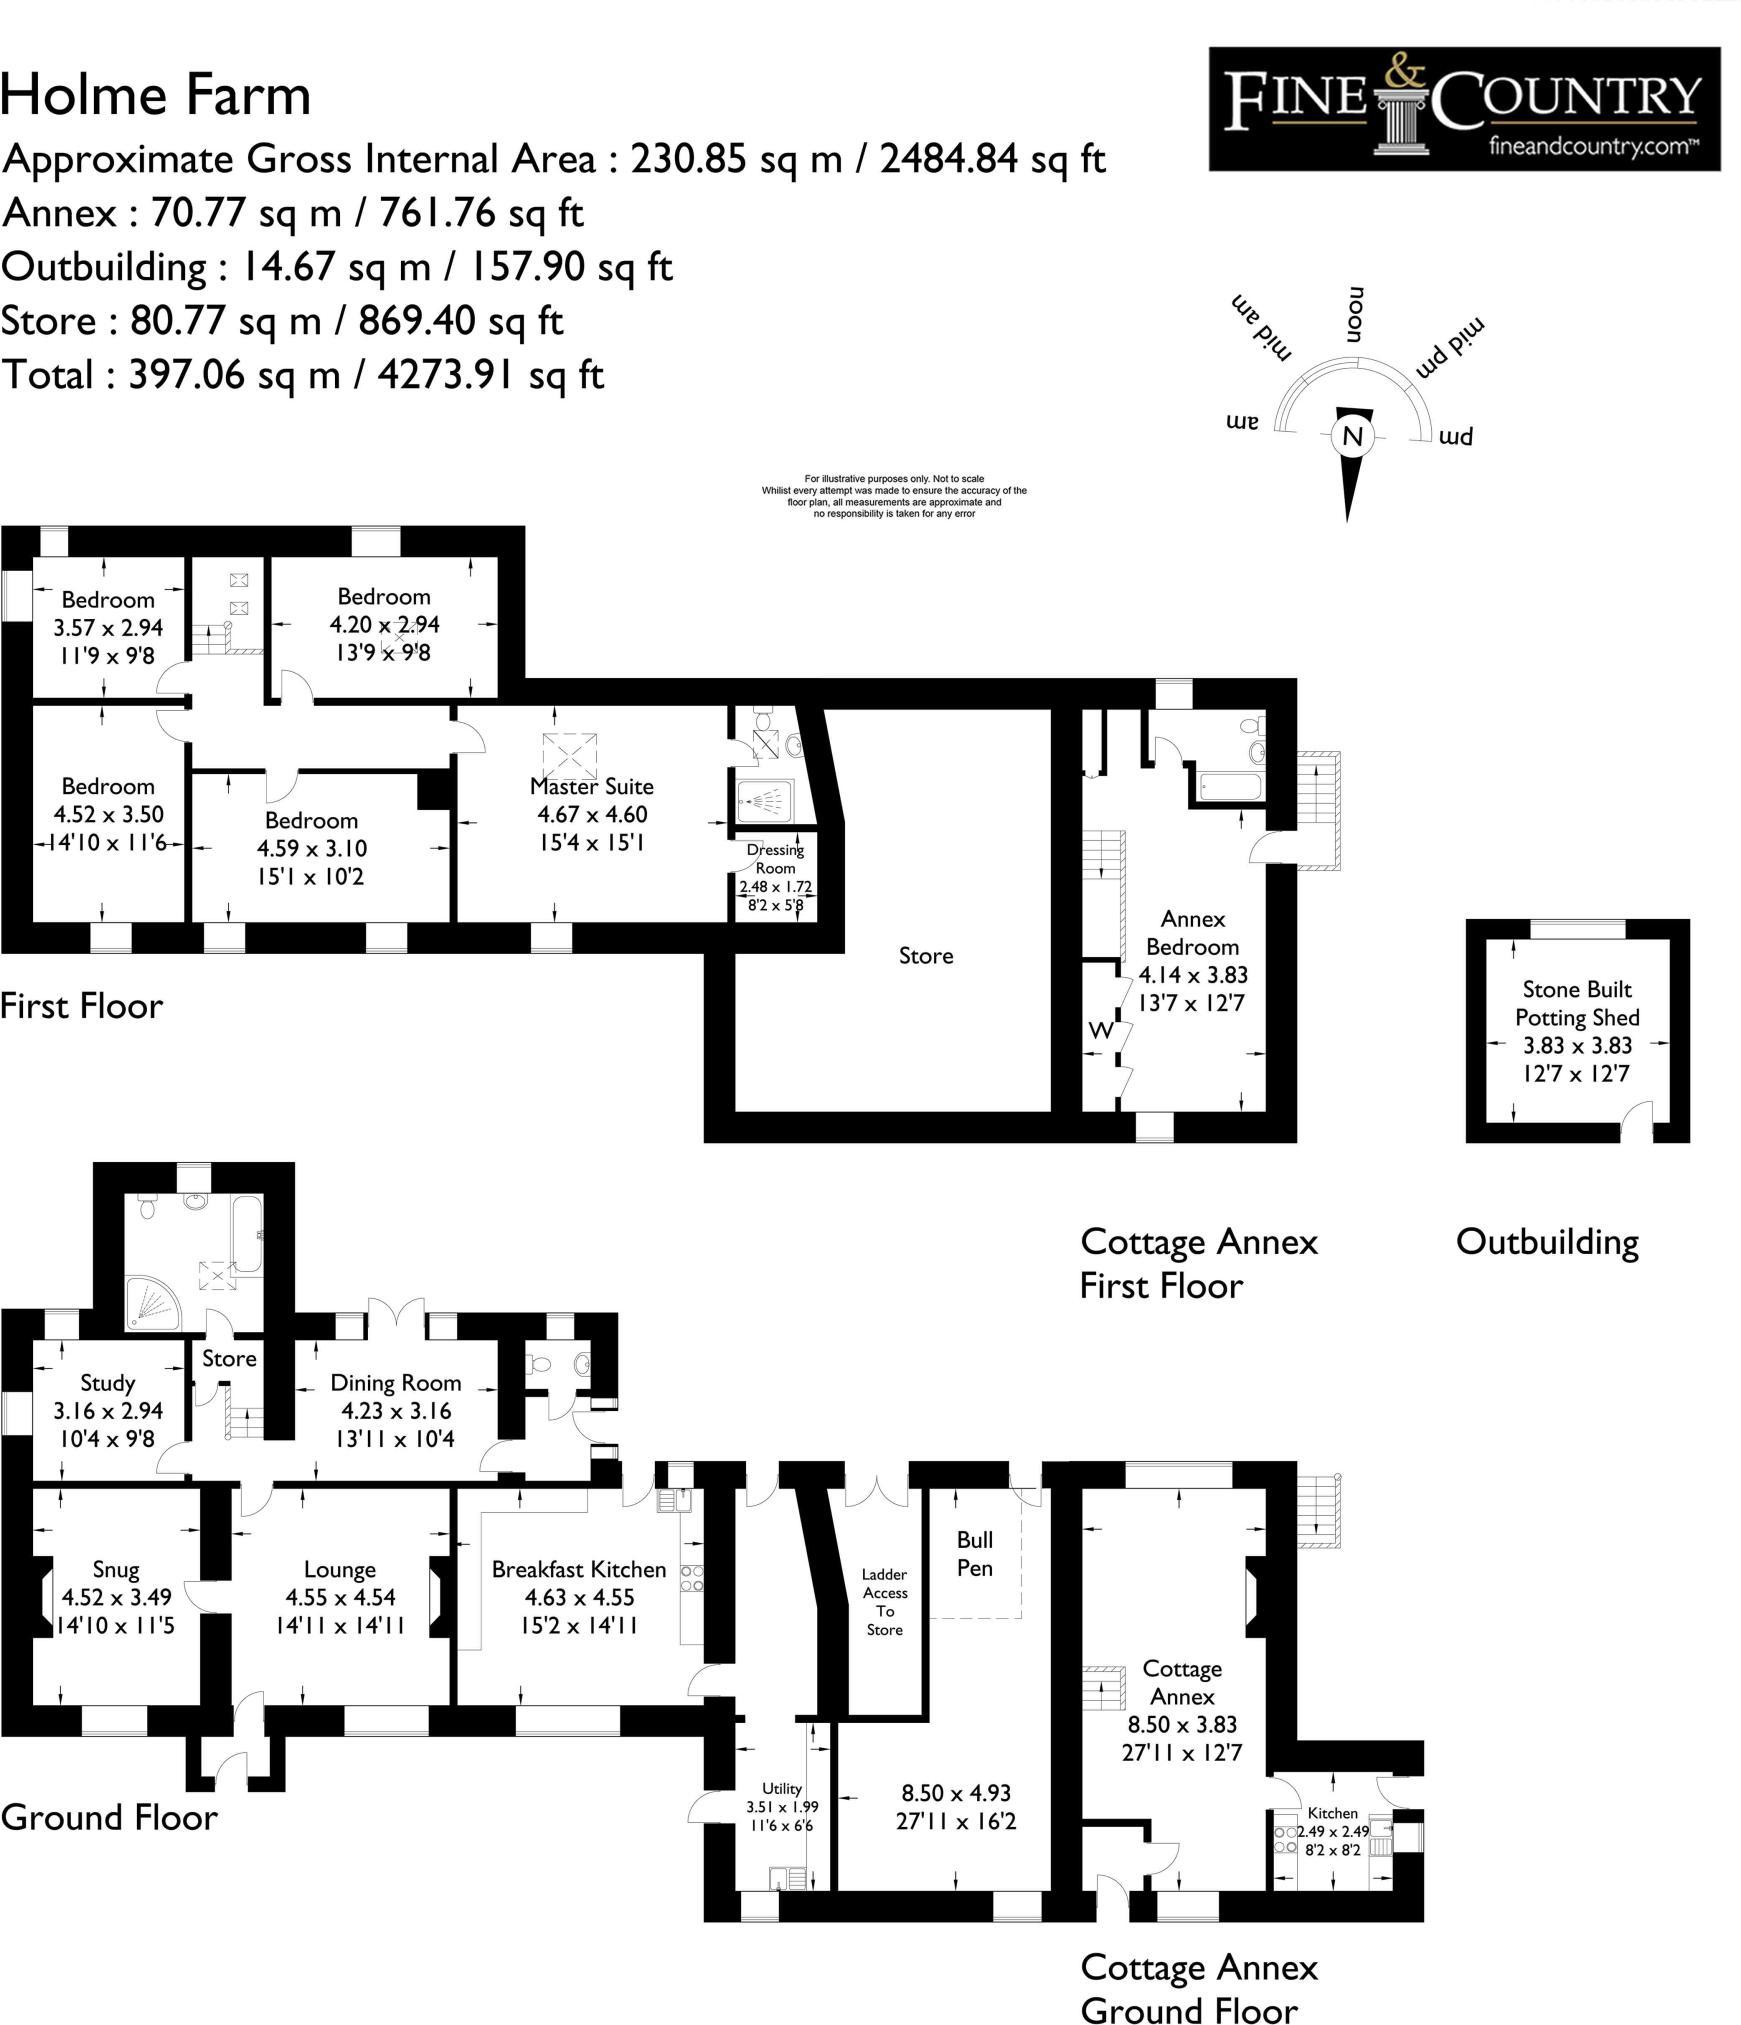 95680 100057001876 FLP 01 0001 max 2025x2025 Top Result 50 New 7 Bedroom House Plans Gallery 2017 Hgd6